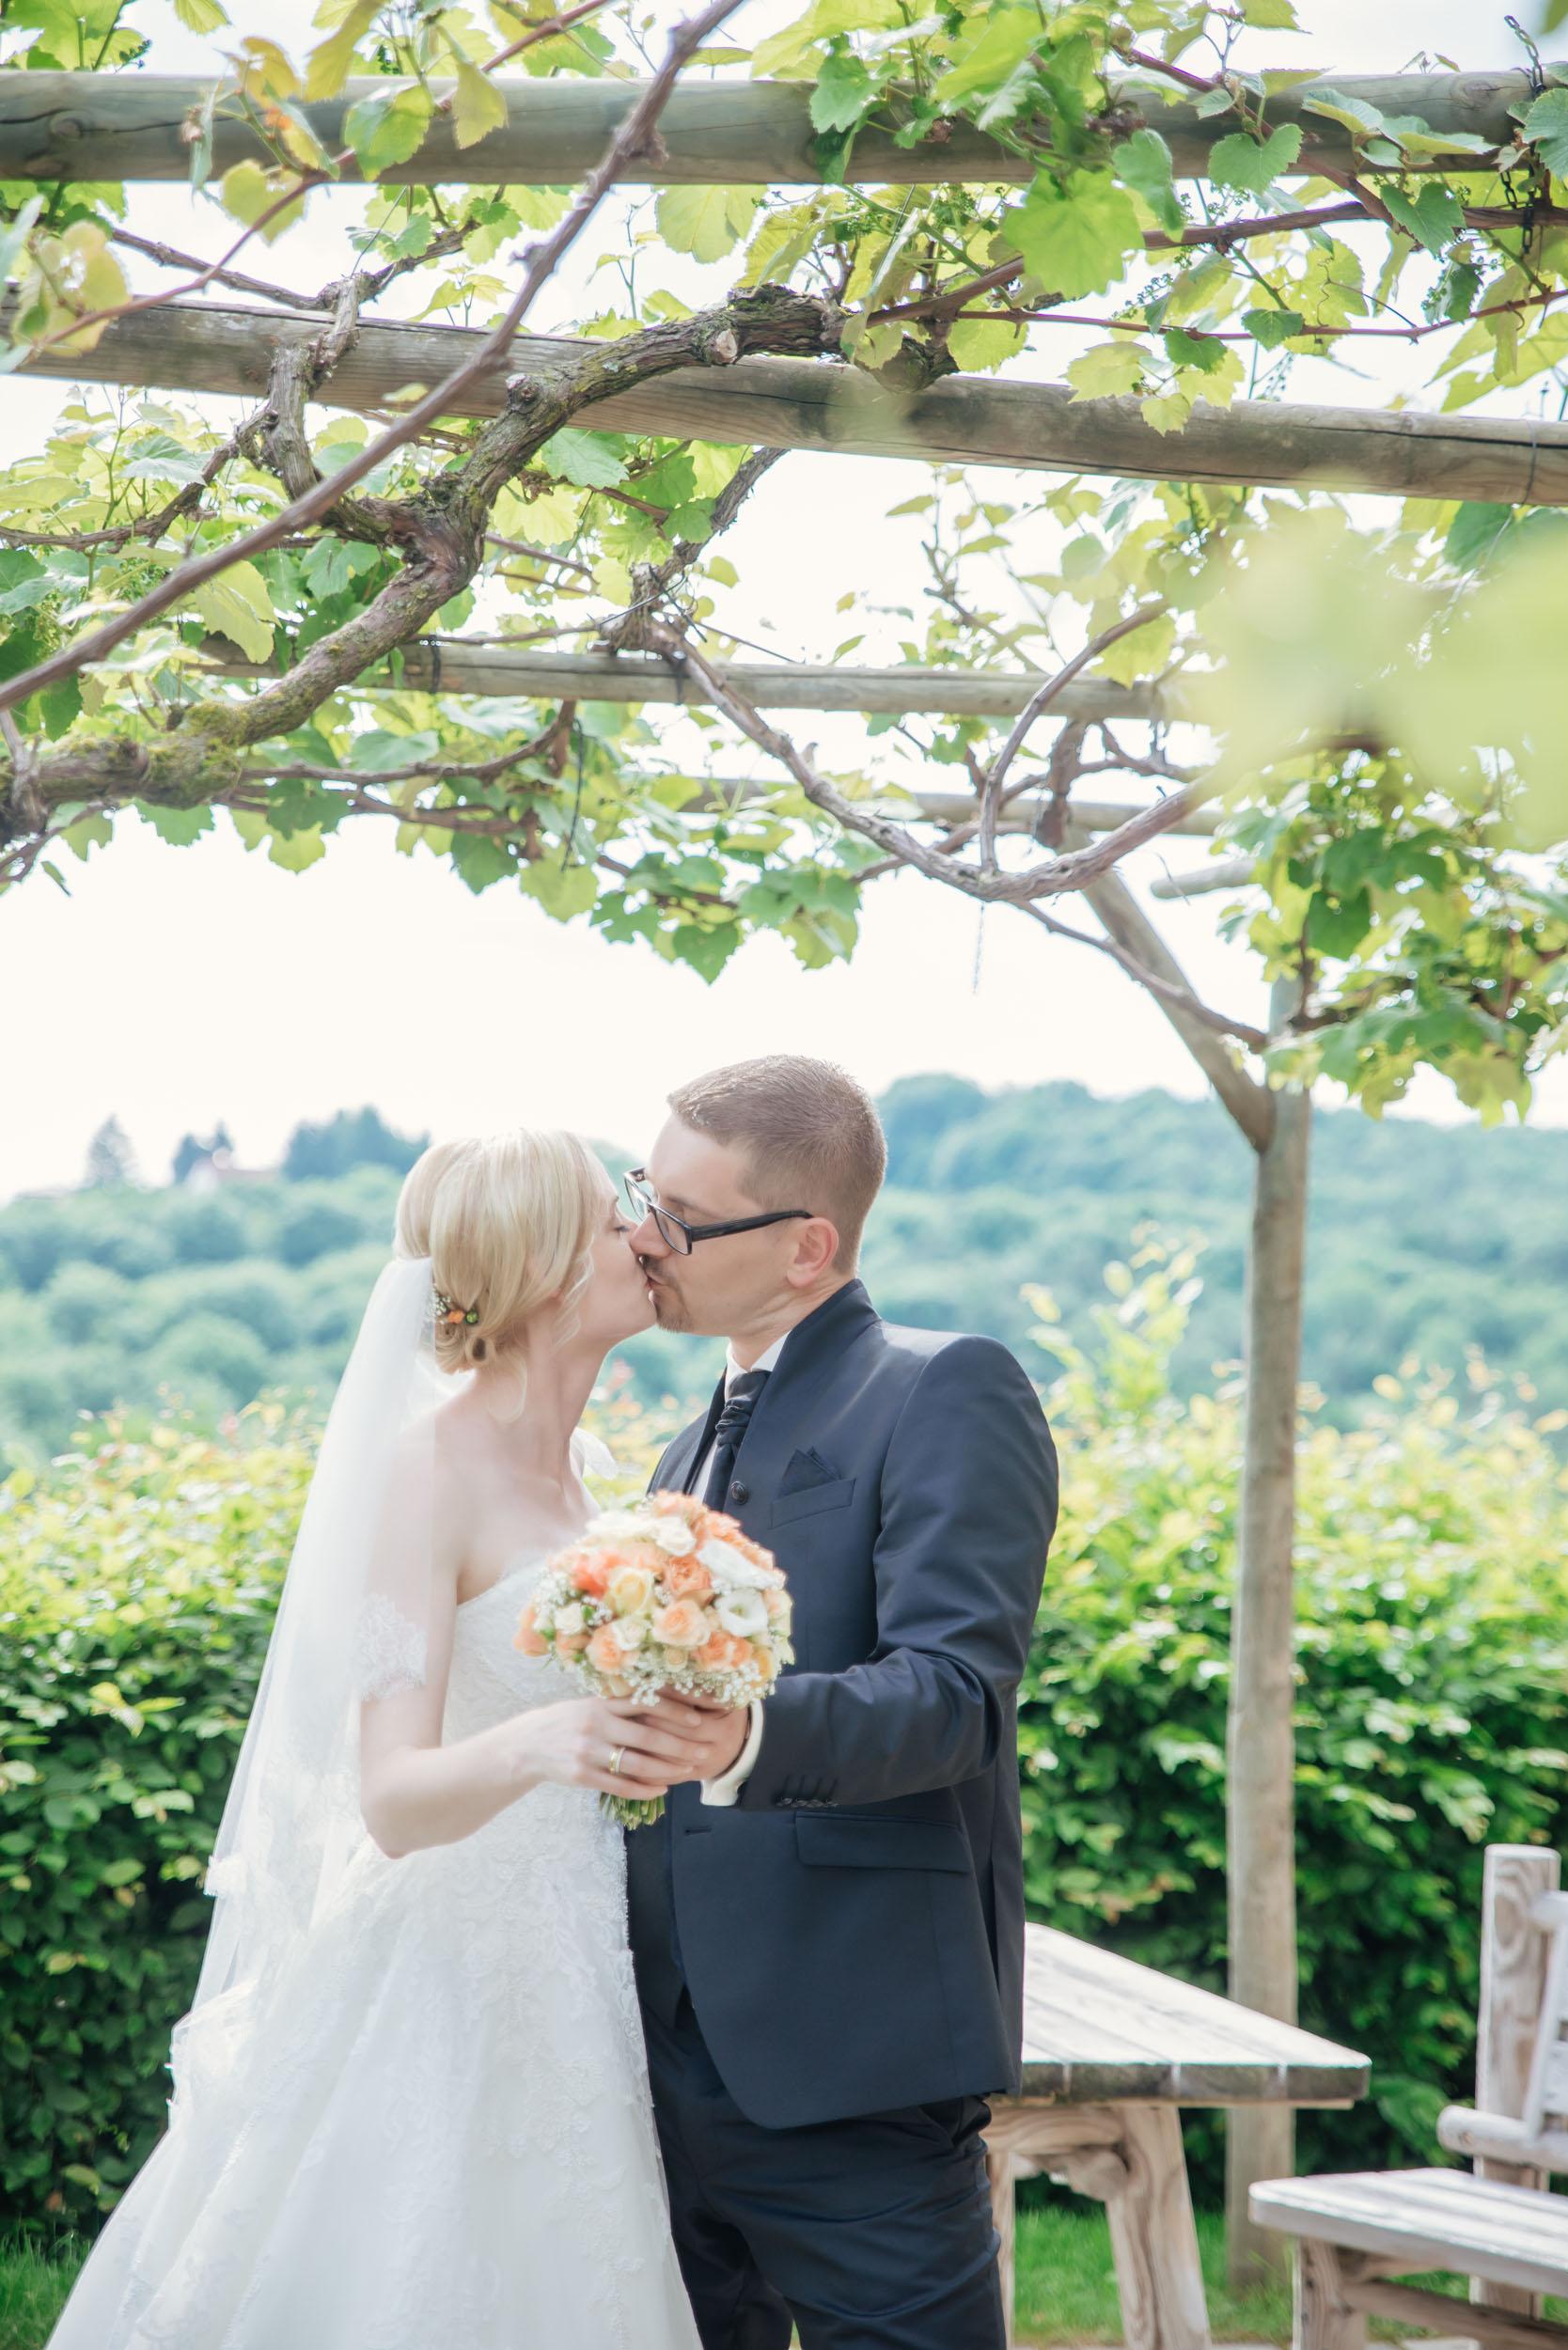 Christine & Robert - Kuss unter Weinlaube